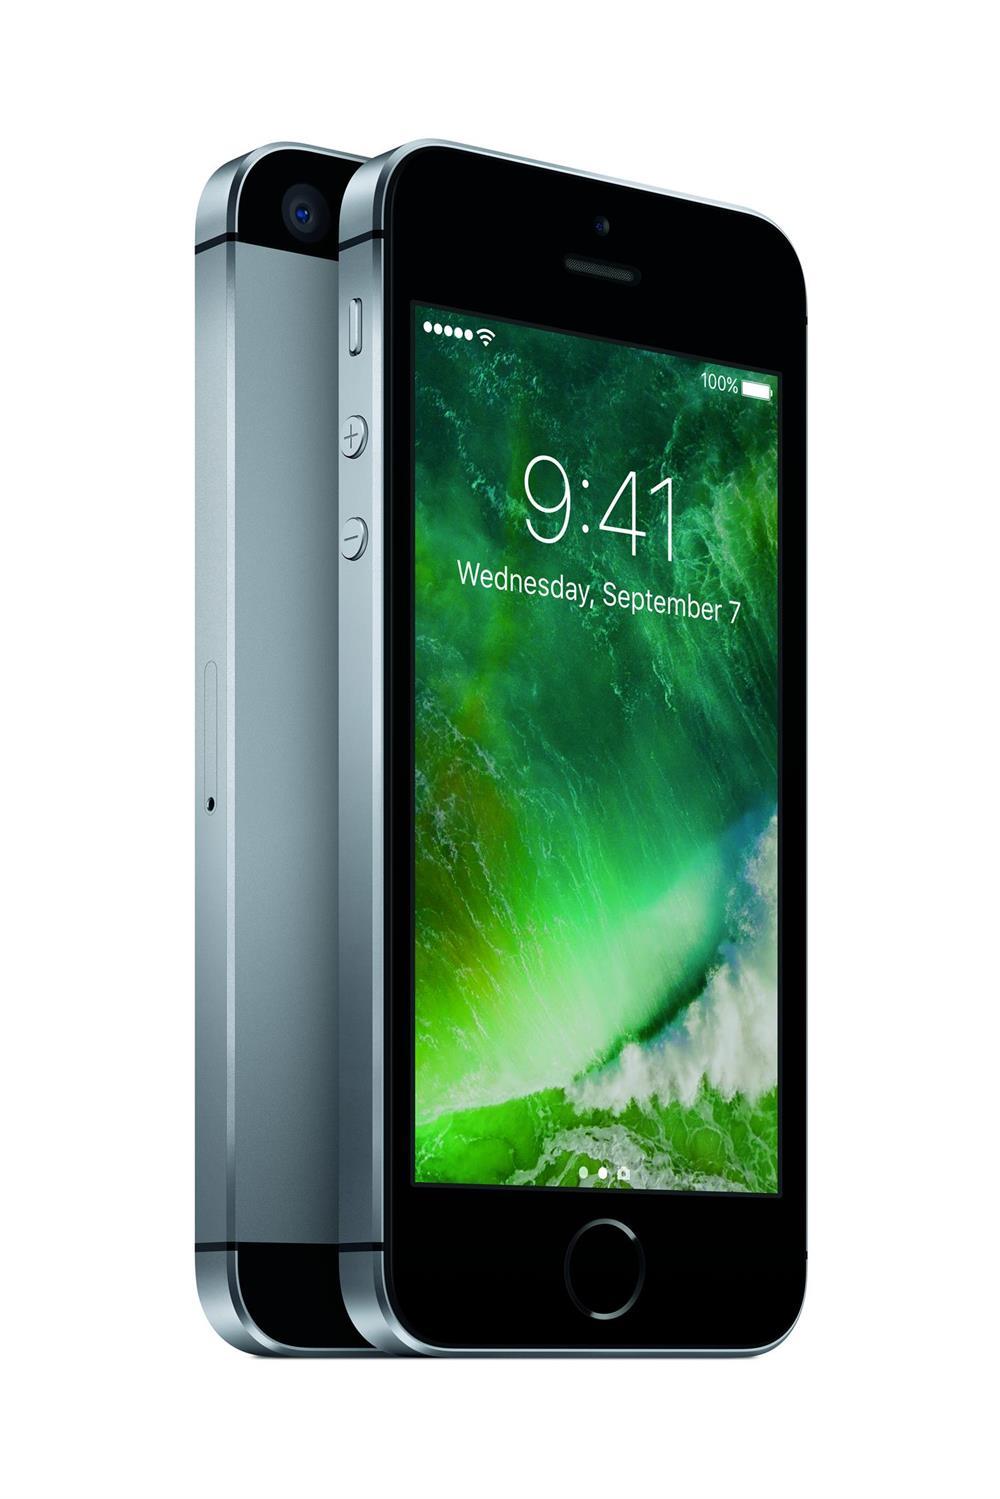 billigst iphone 5